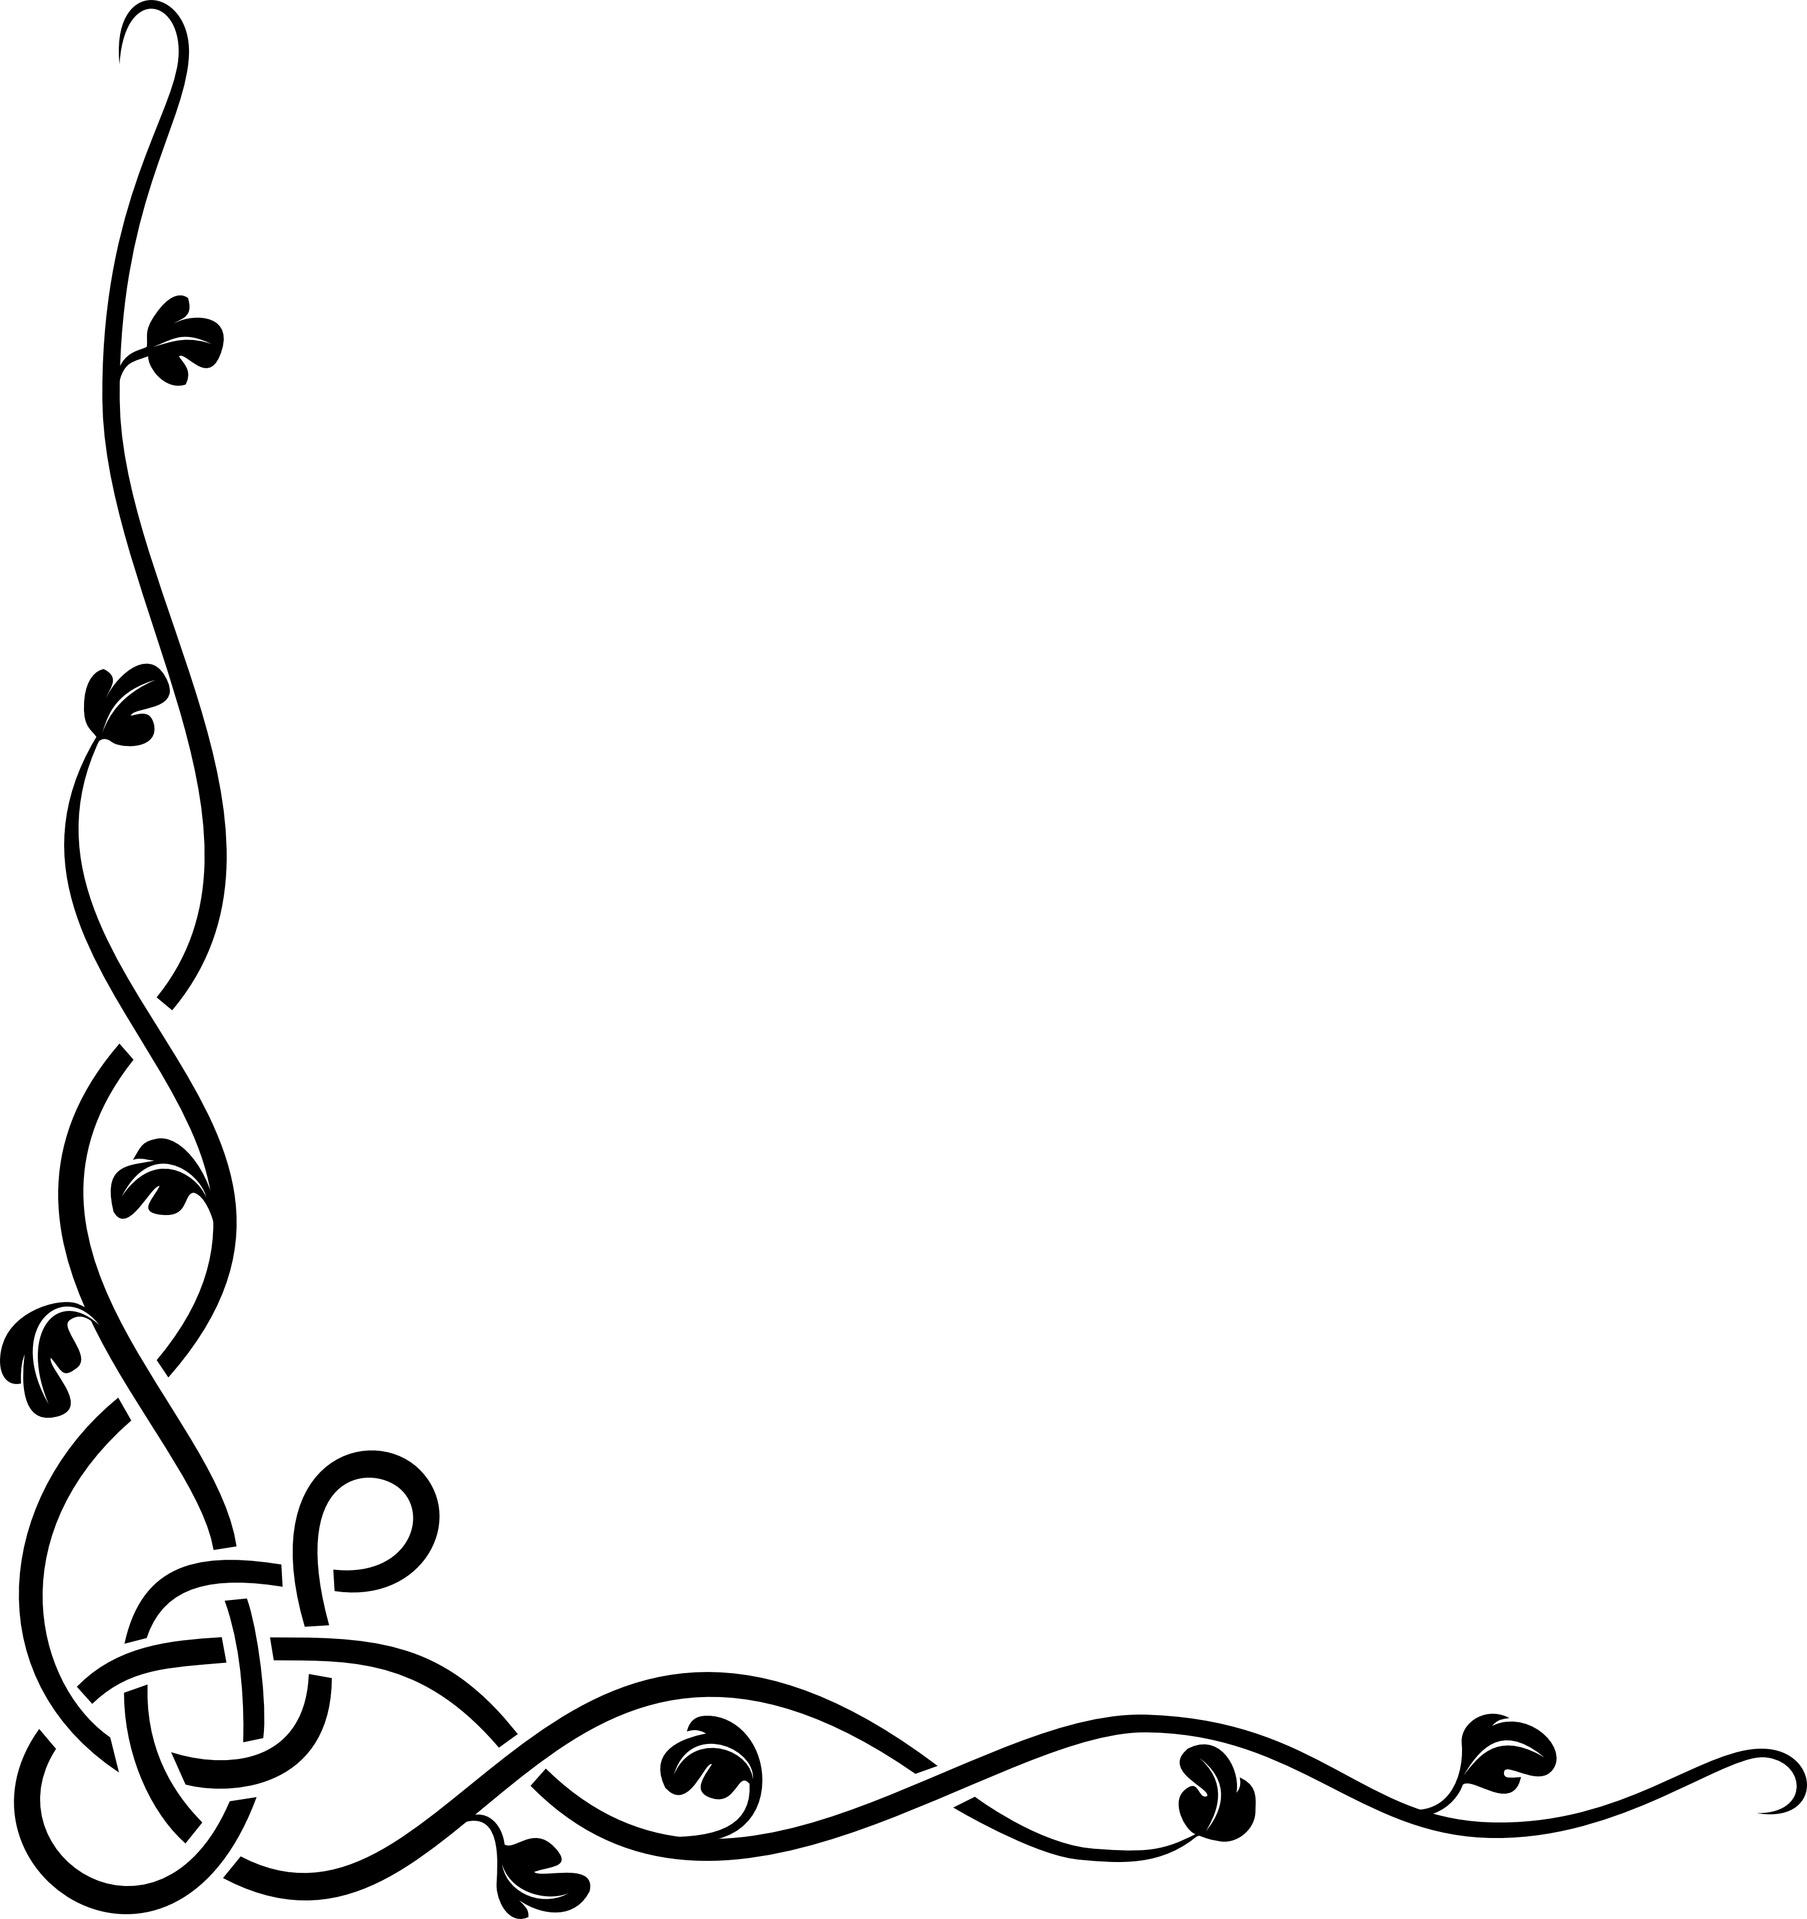 1807x1919 Clipart Celtic Knot Image 3